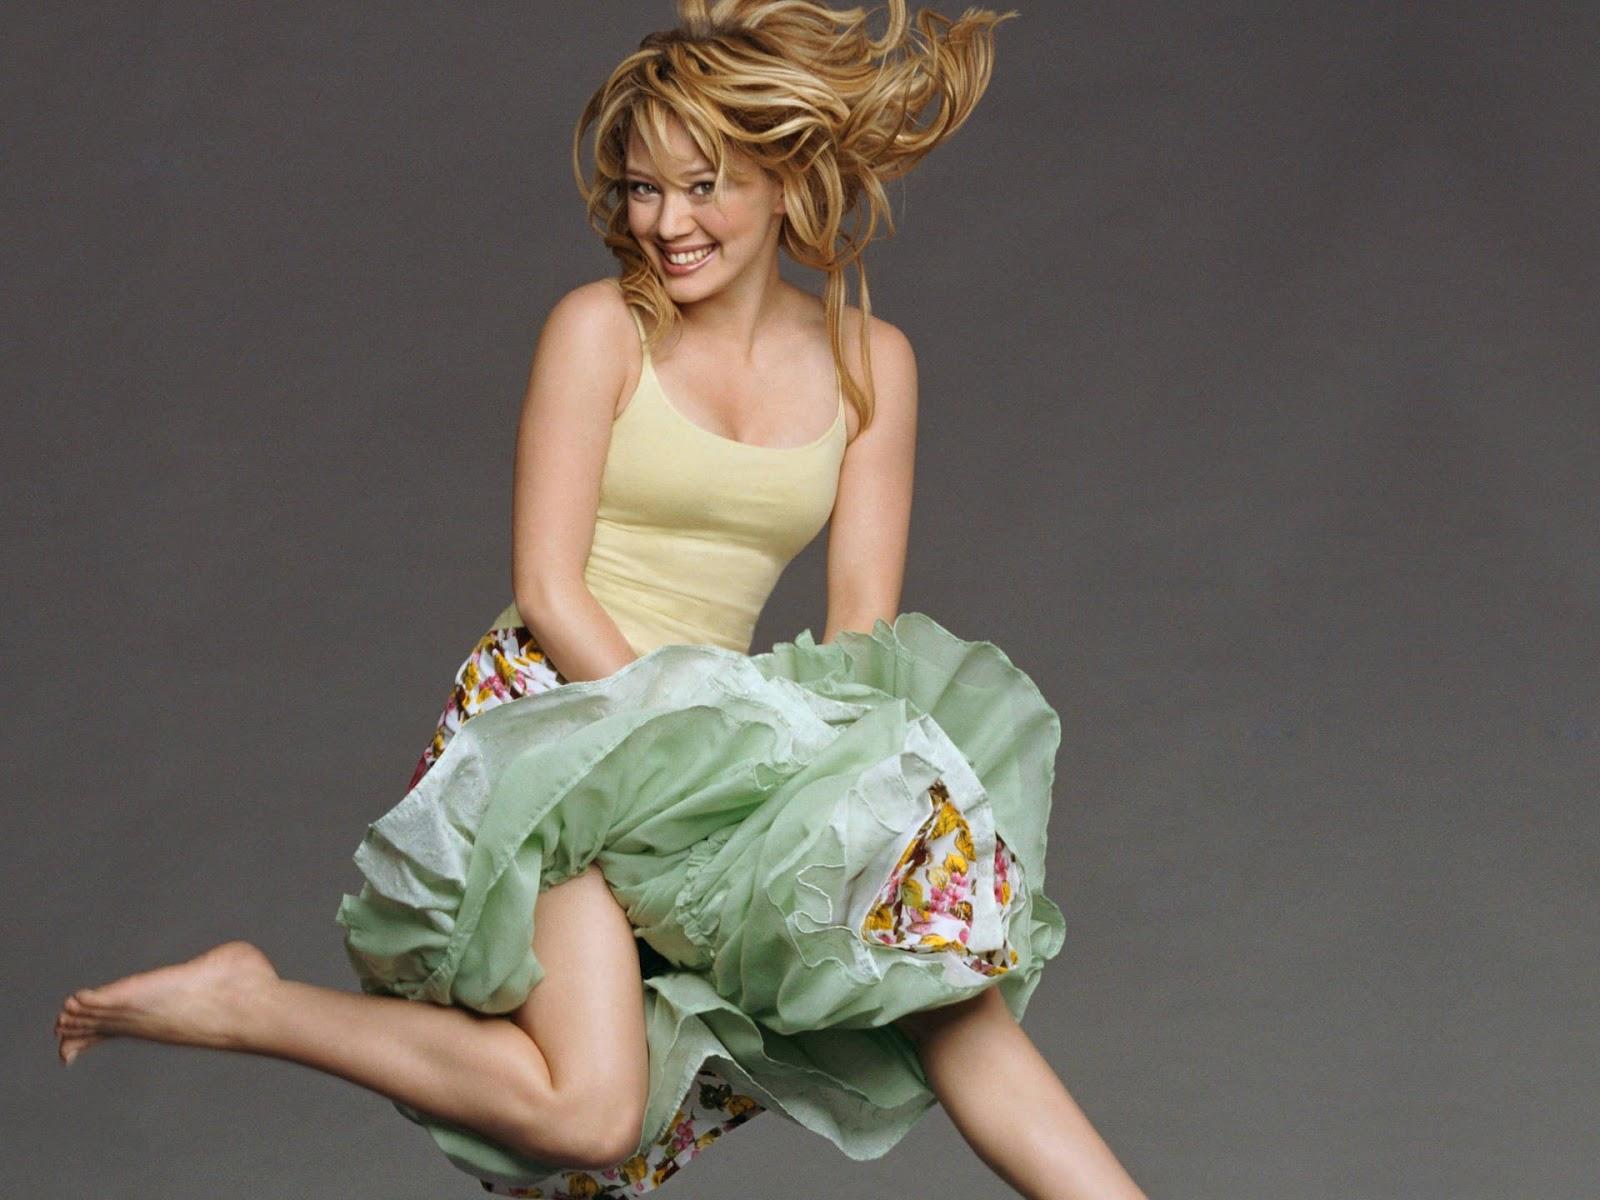 Hilary Duff Demi Lovato Judge